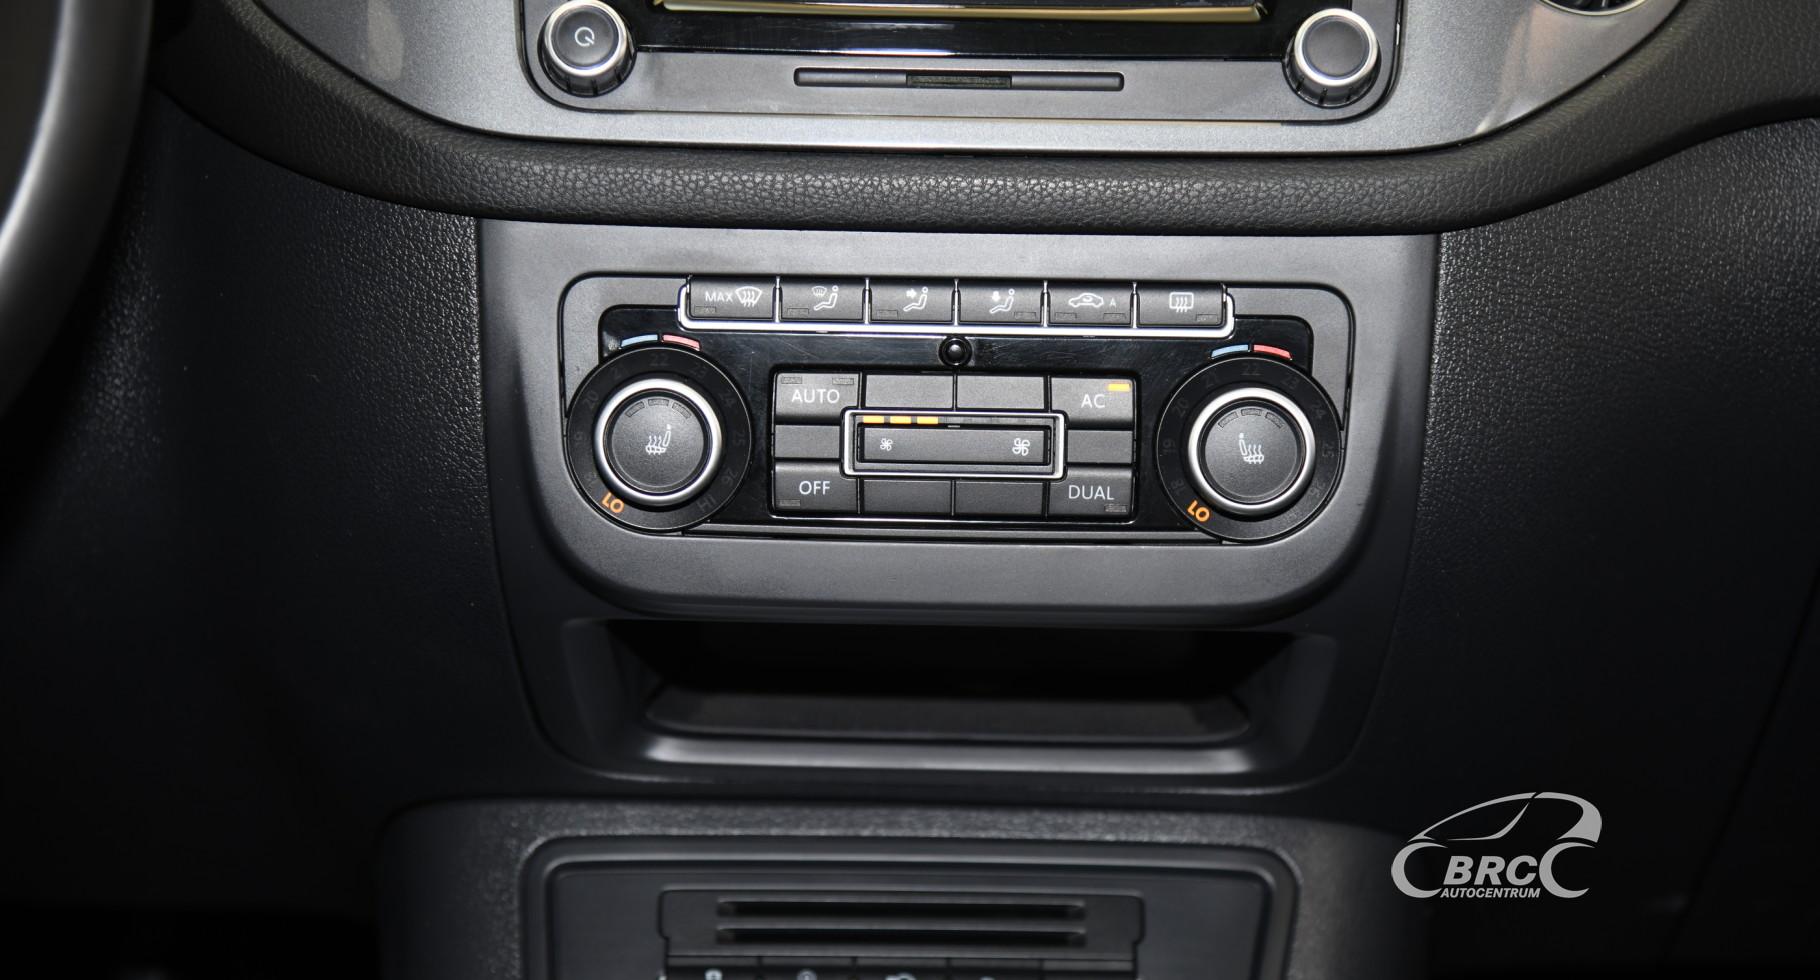 Volkswagen Tiguan 2.0 TDI Sport 4Motion